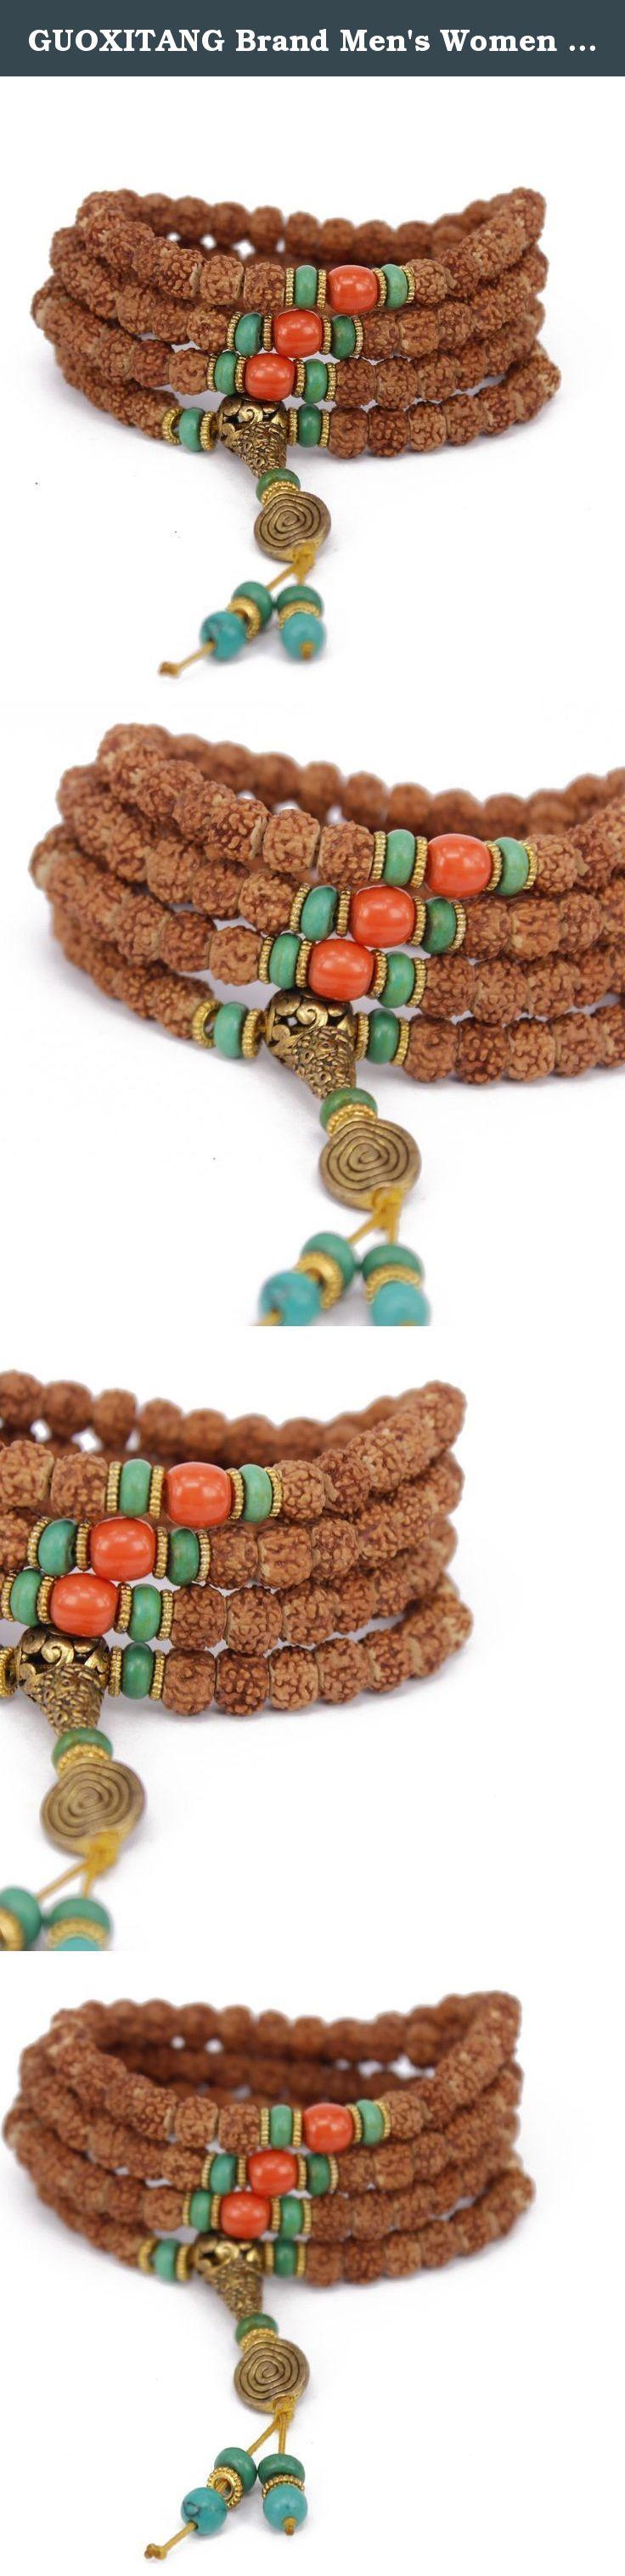 Guoxitang brand menus women bodhi seed wood bracelet link wrist